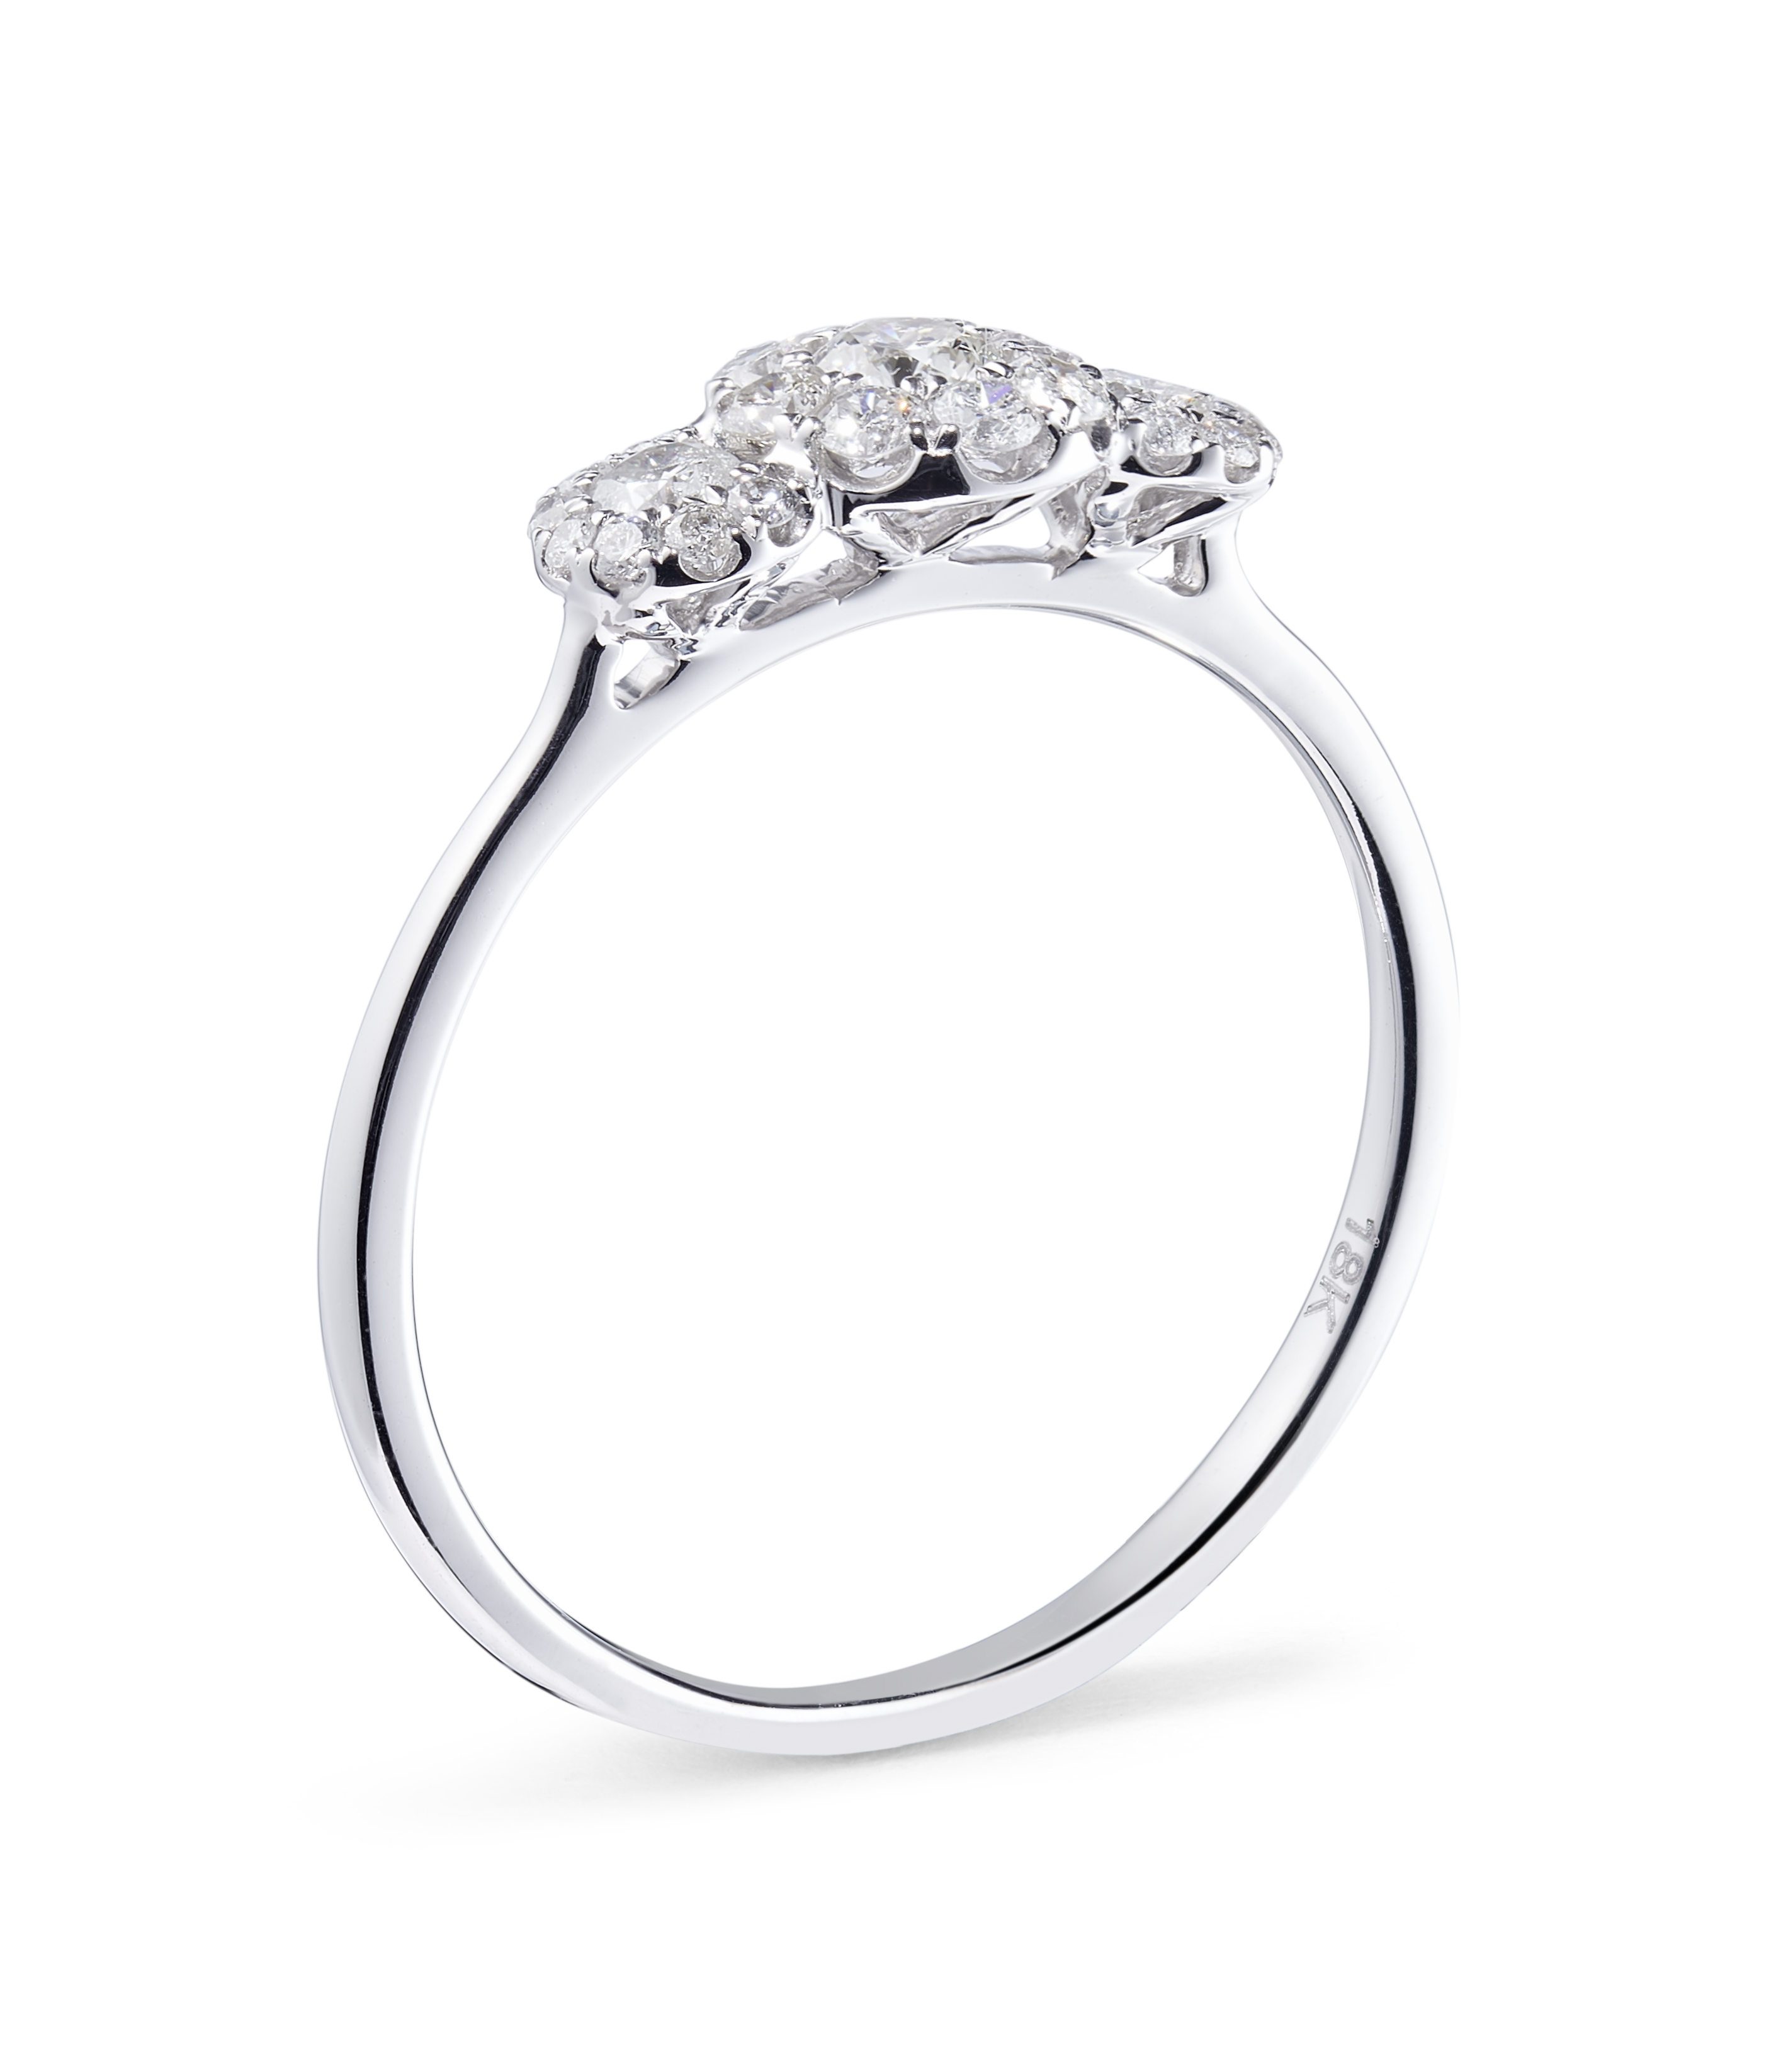 18ct White Gold Triple Cluster Diamond Ring